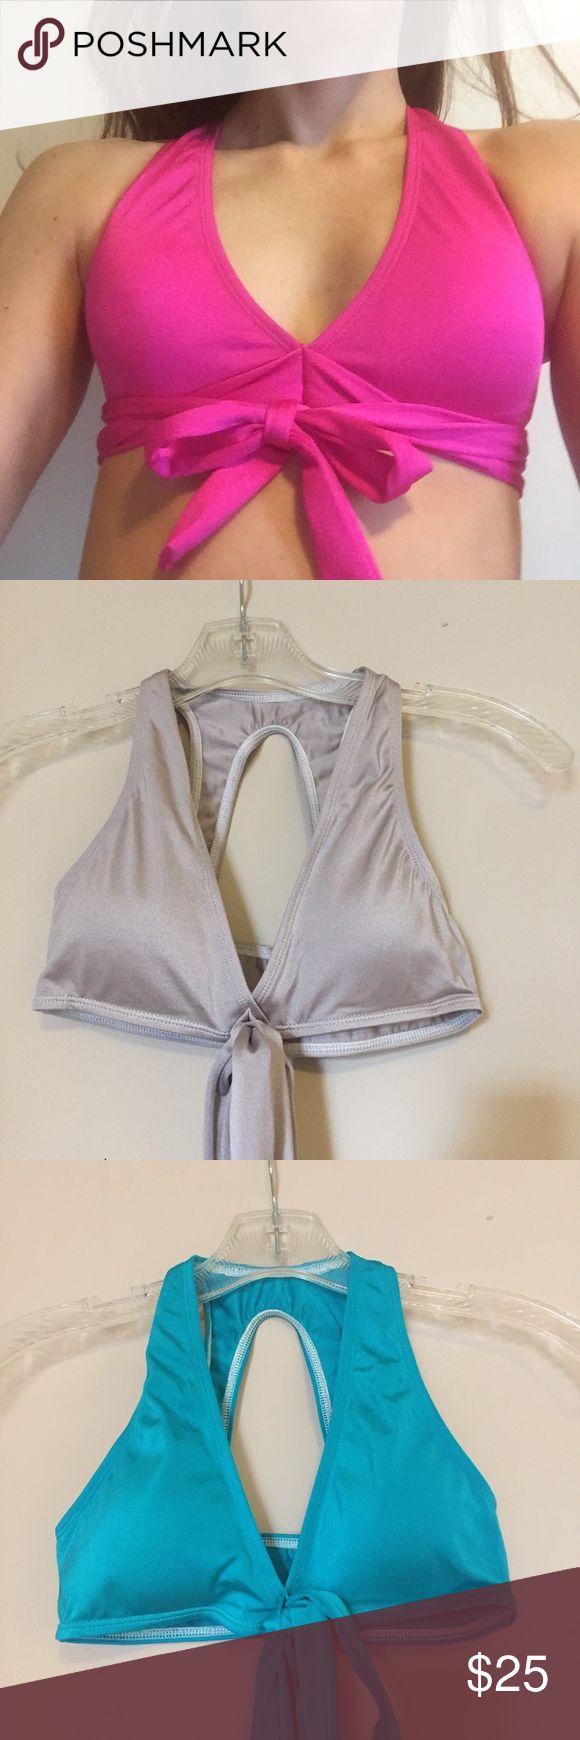 Flexilexi sports bras Gorgeous, could double as bikini top flexi lexi Tops Crop Tops